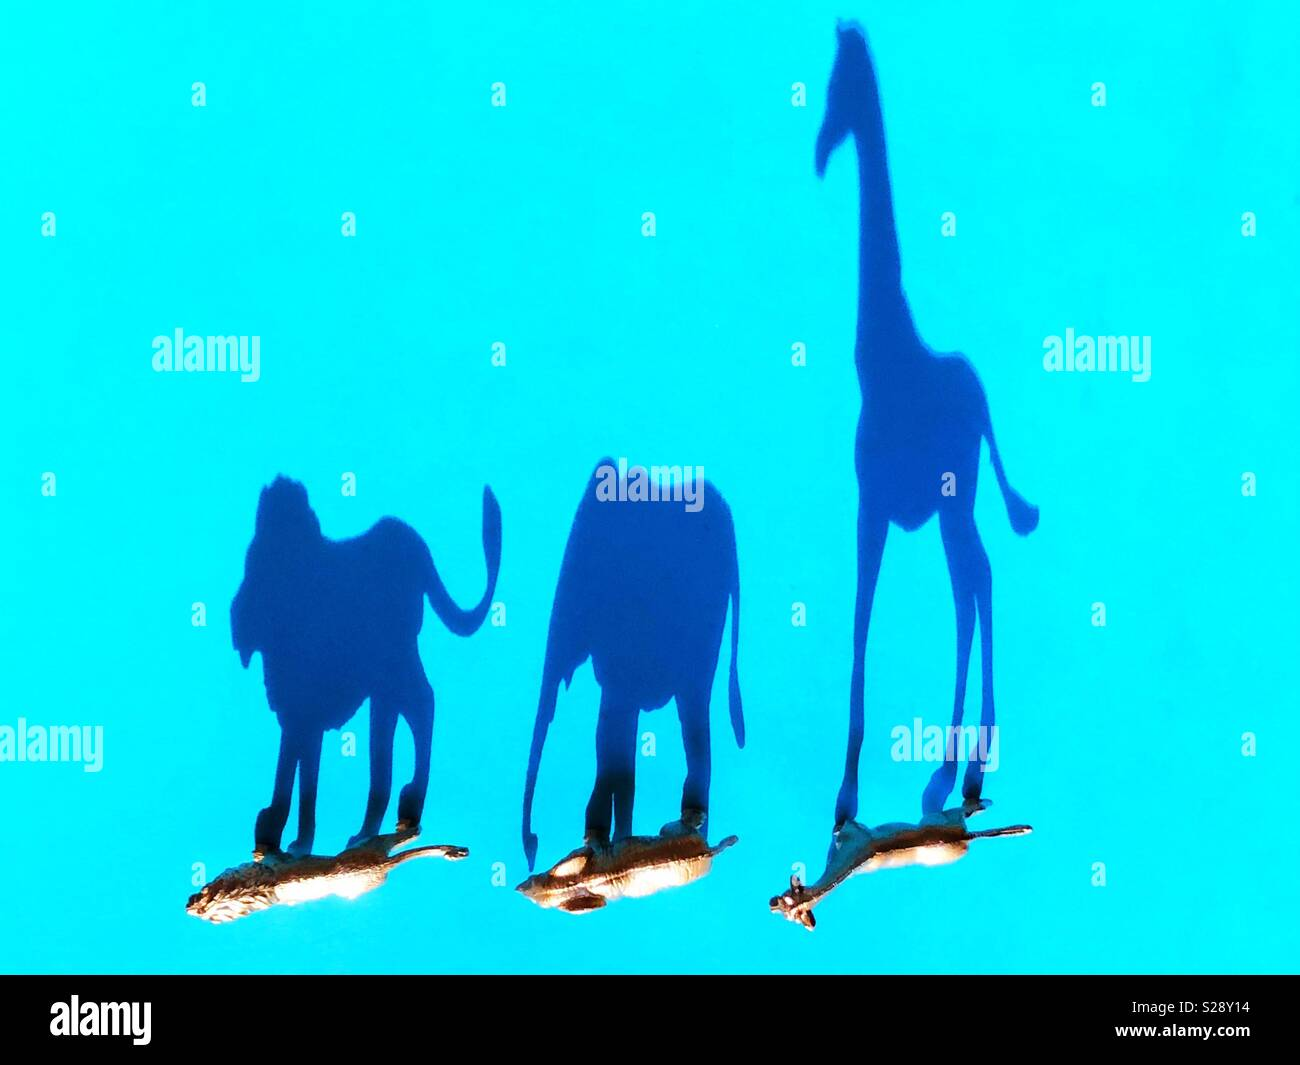 Wildlife figurines and shadows. - Stock Image